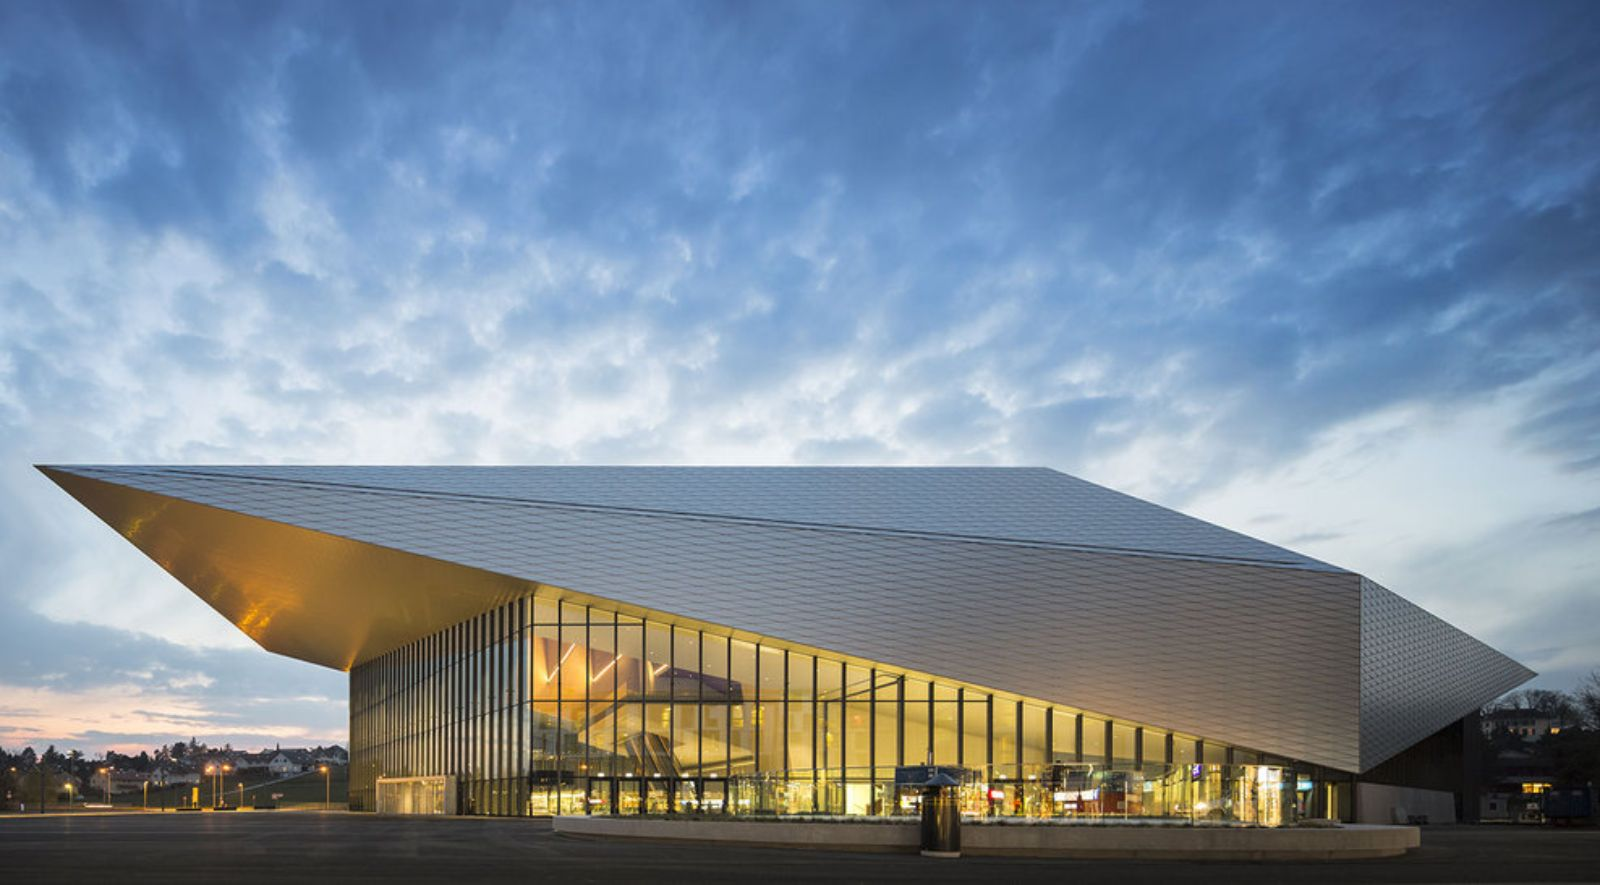 exhibition design company in Switzerland